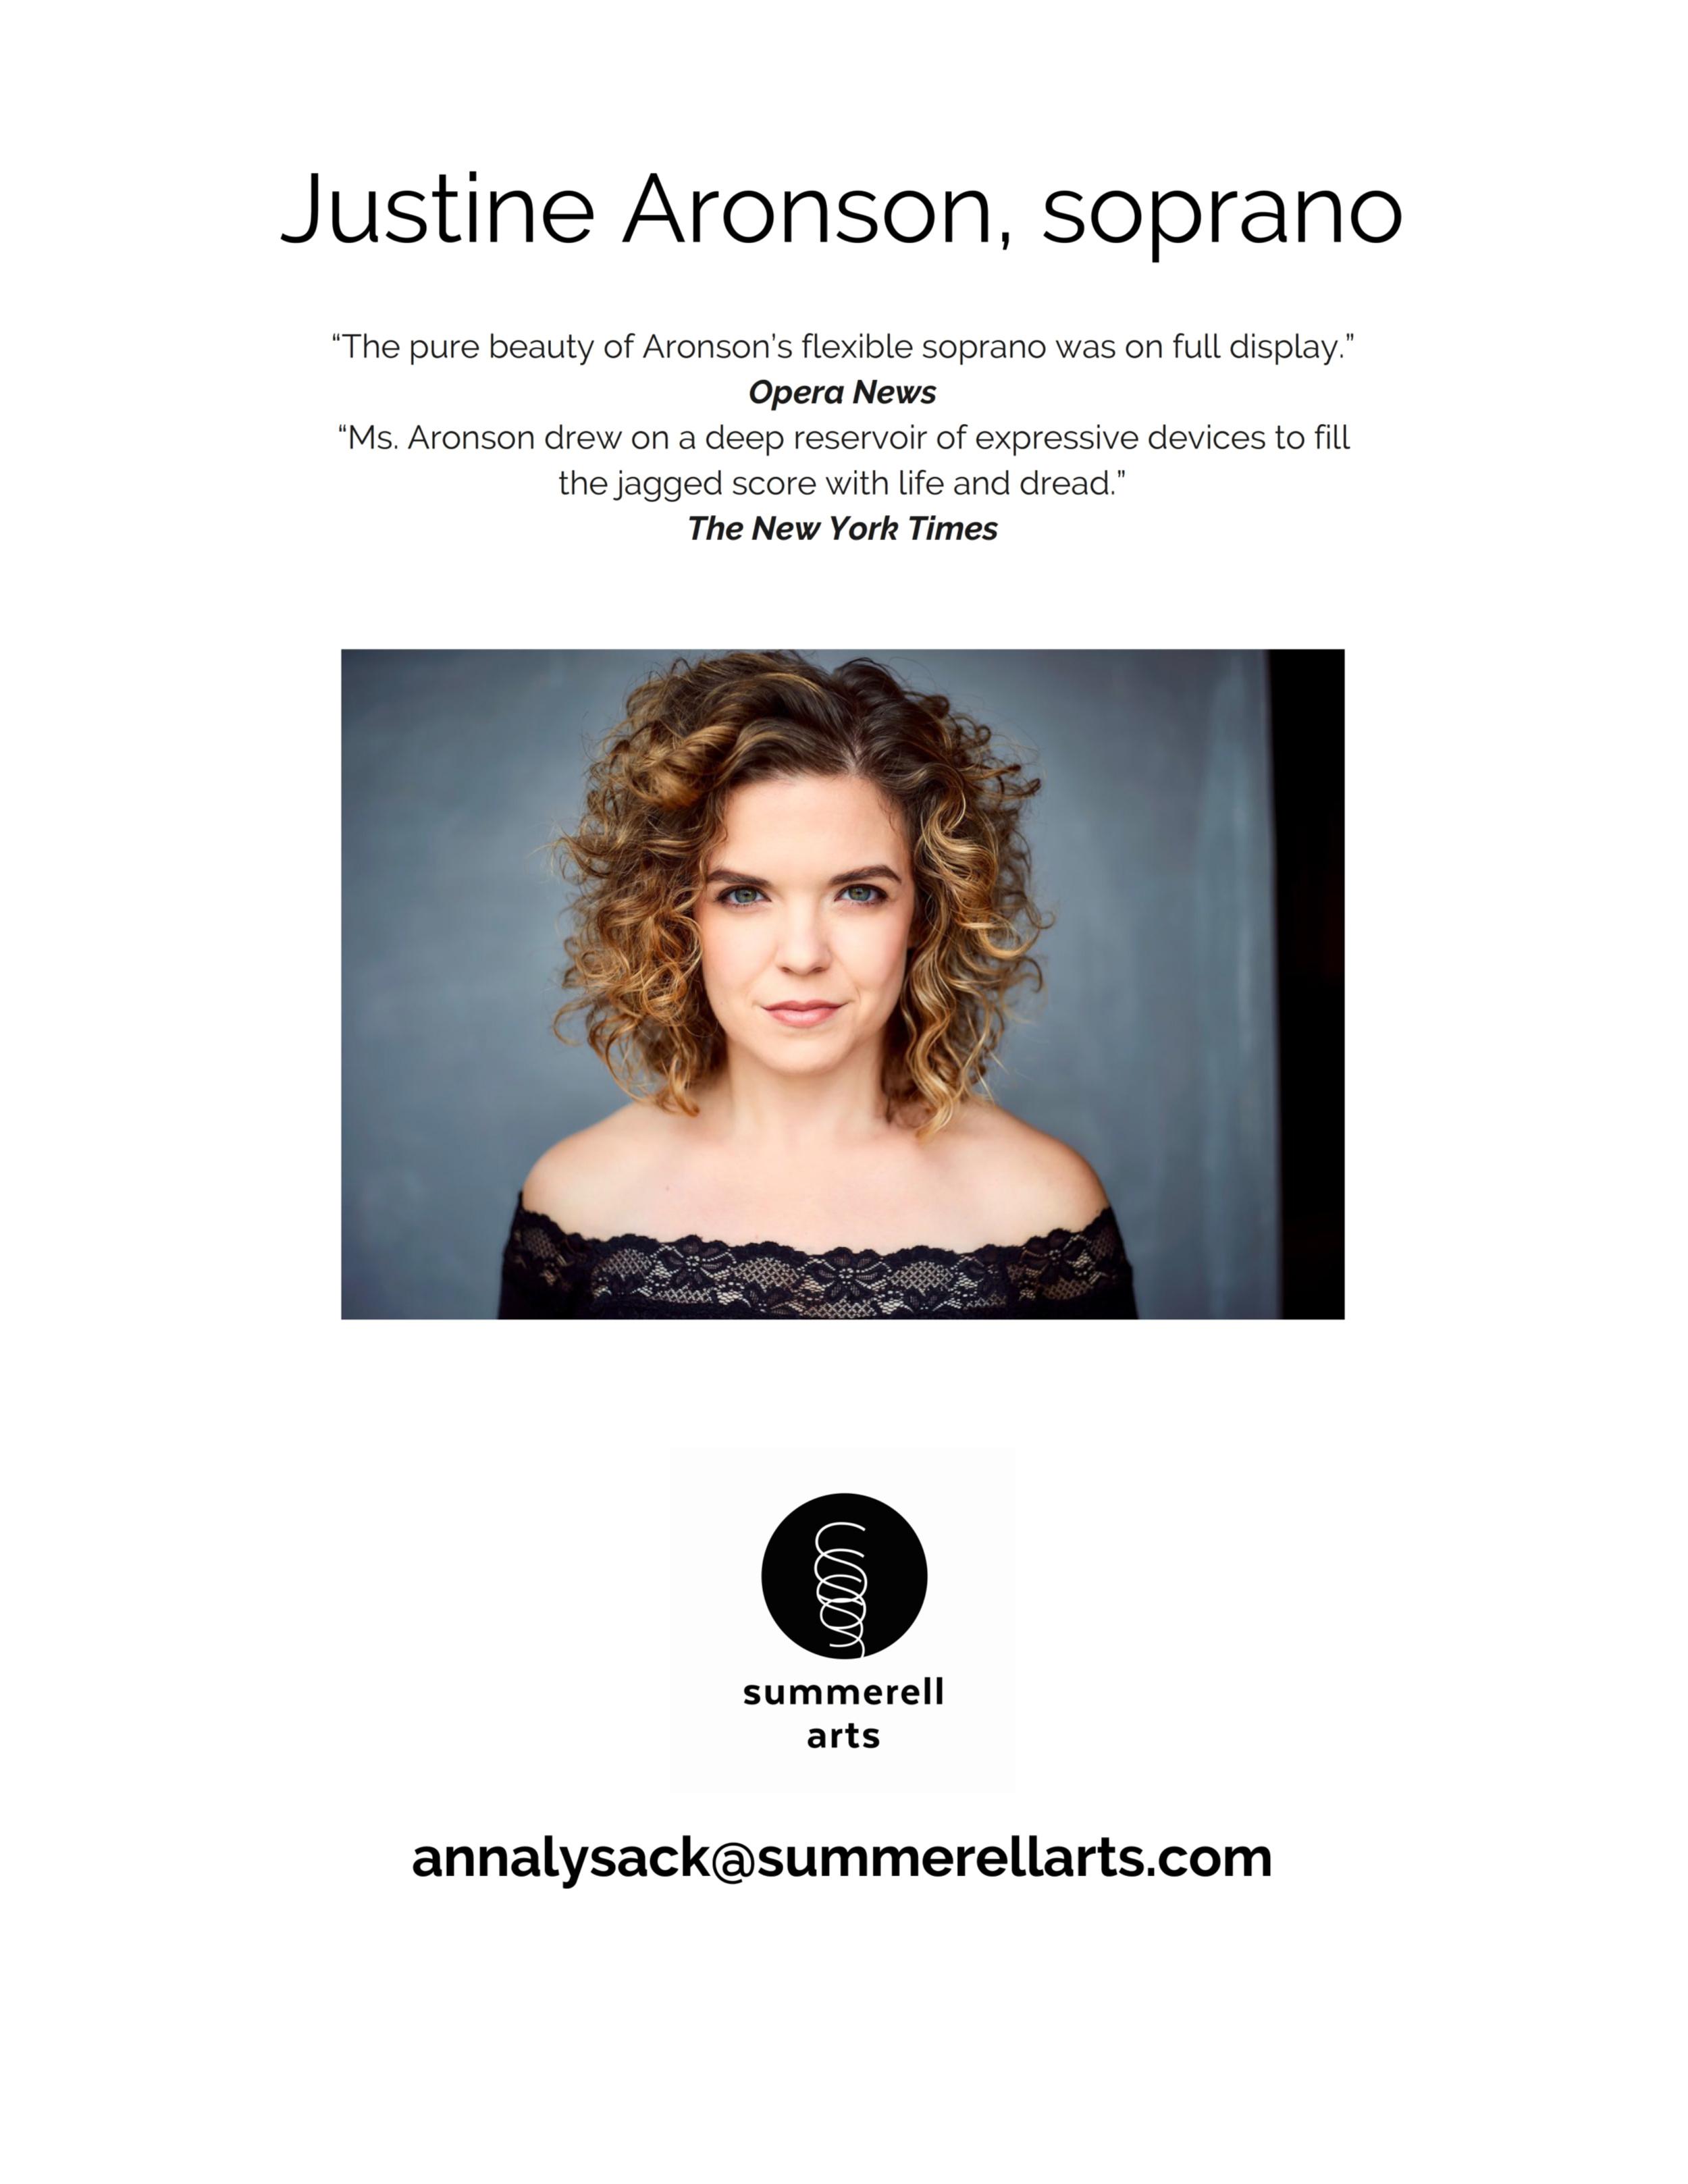 Justine Aronson, soprano - Artist Information Sheet